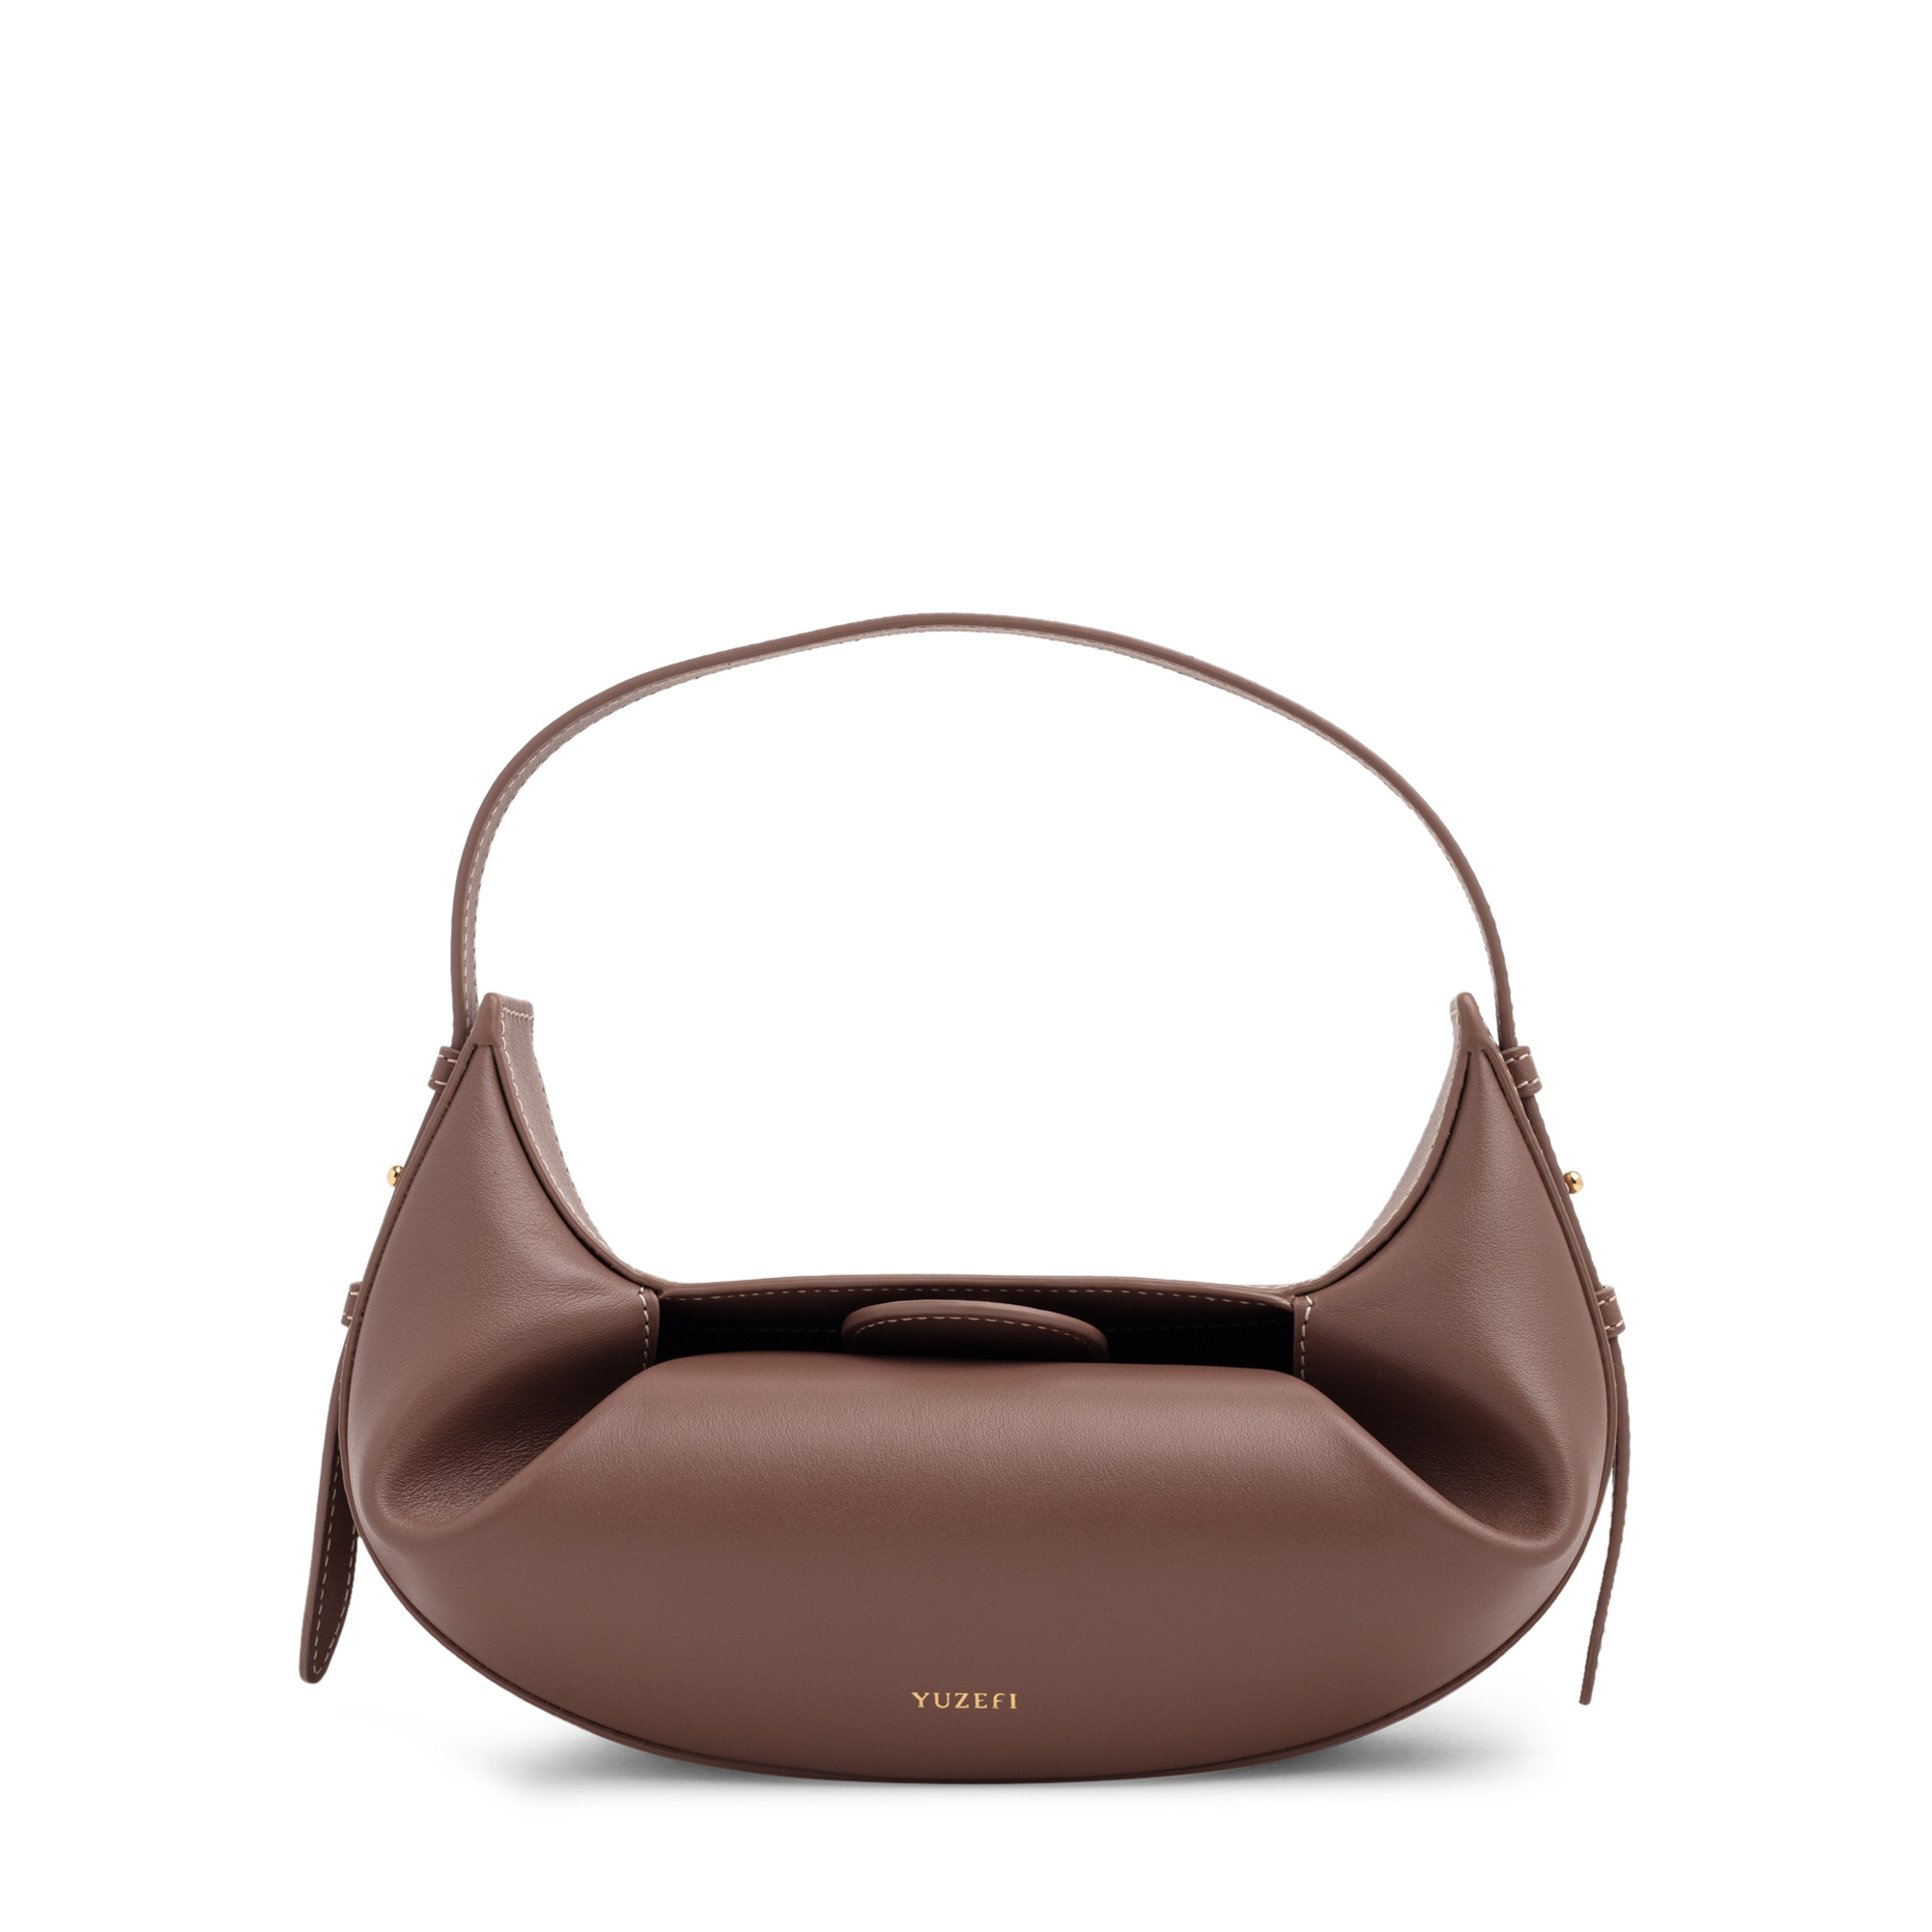 Mini Fortune Cookie shoulder bag